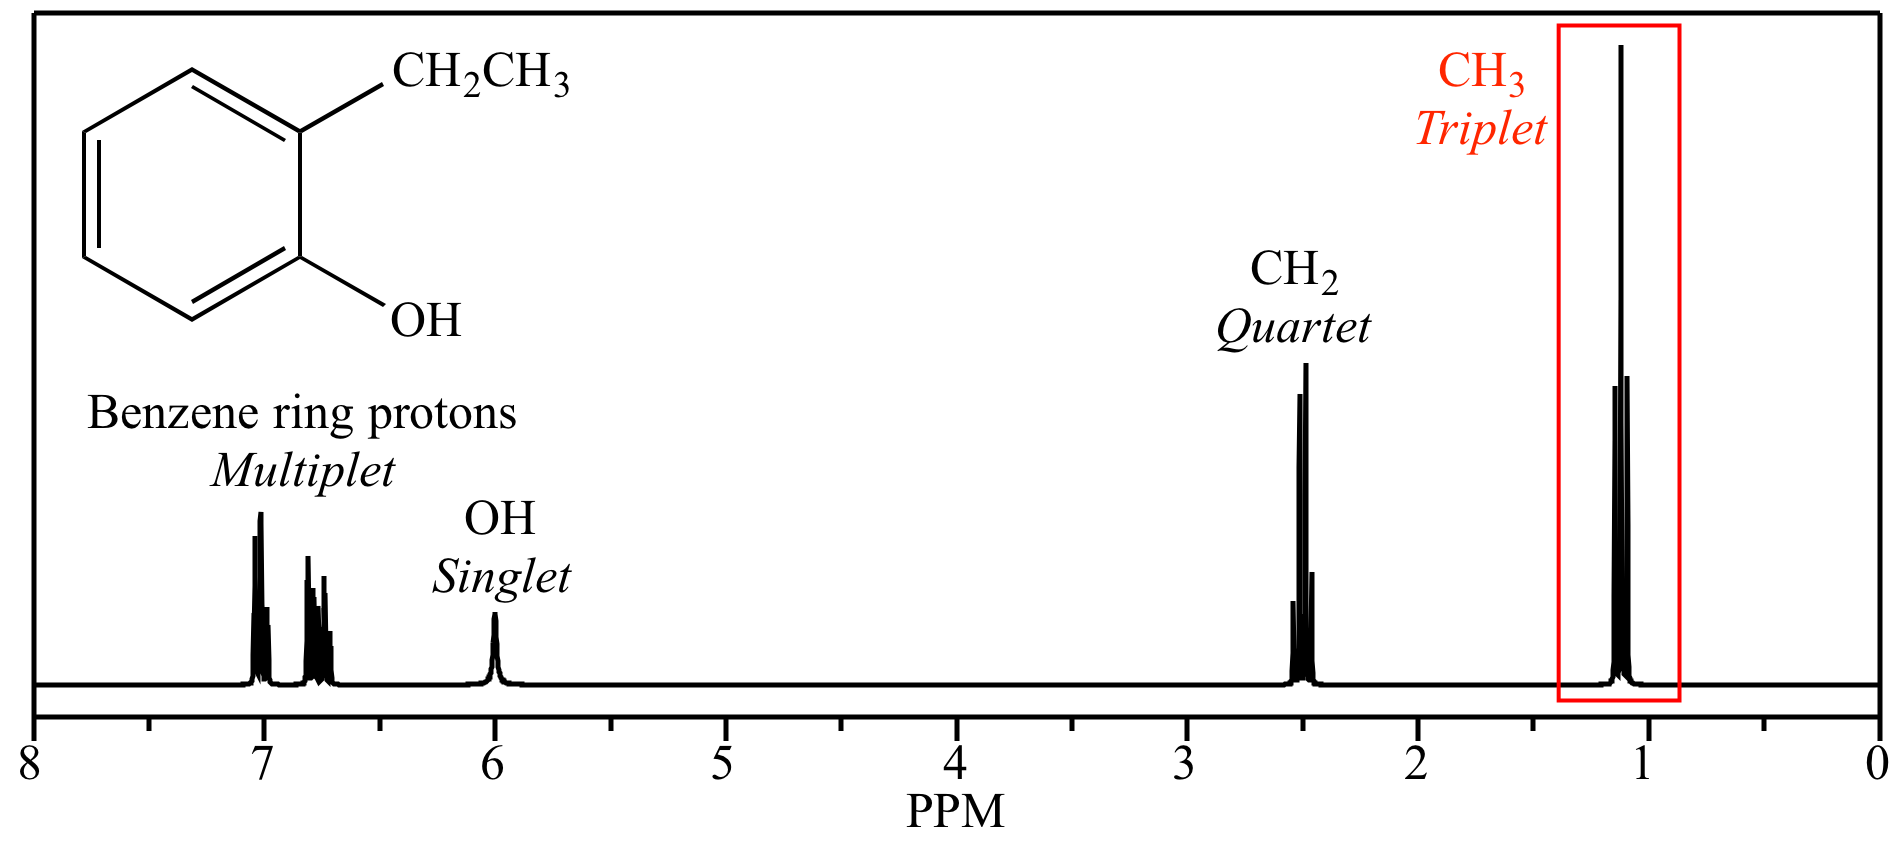 Proton Chemical Shift Value